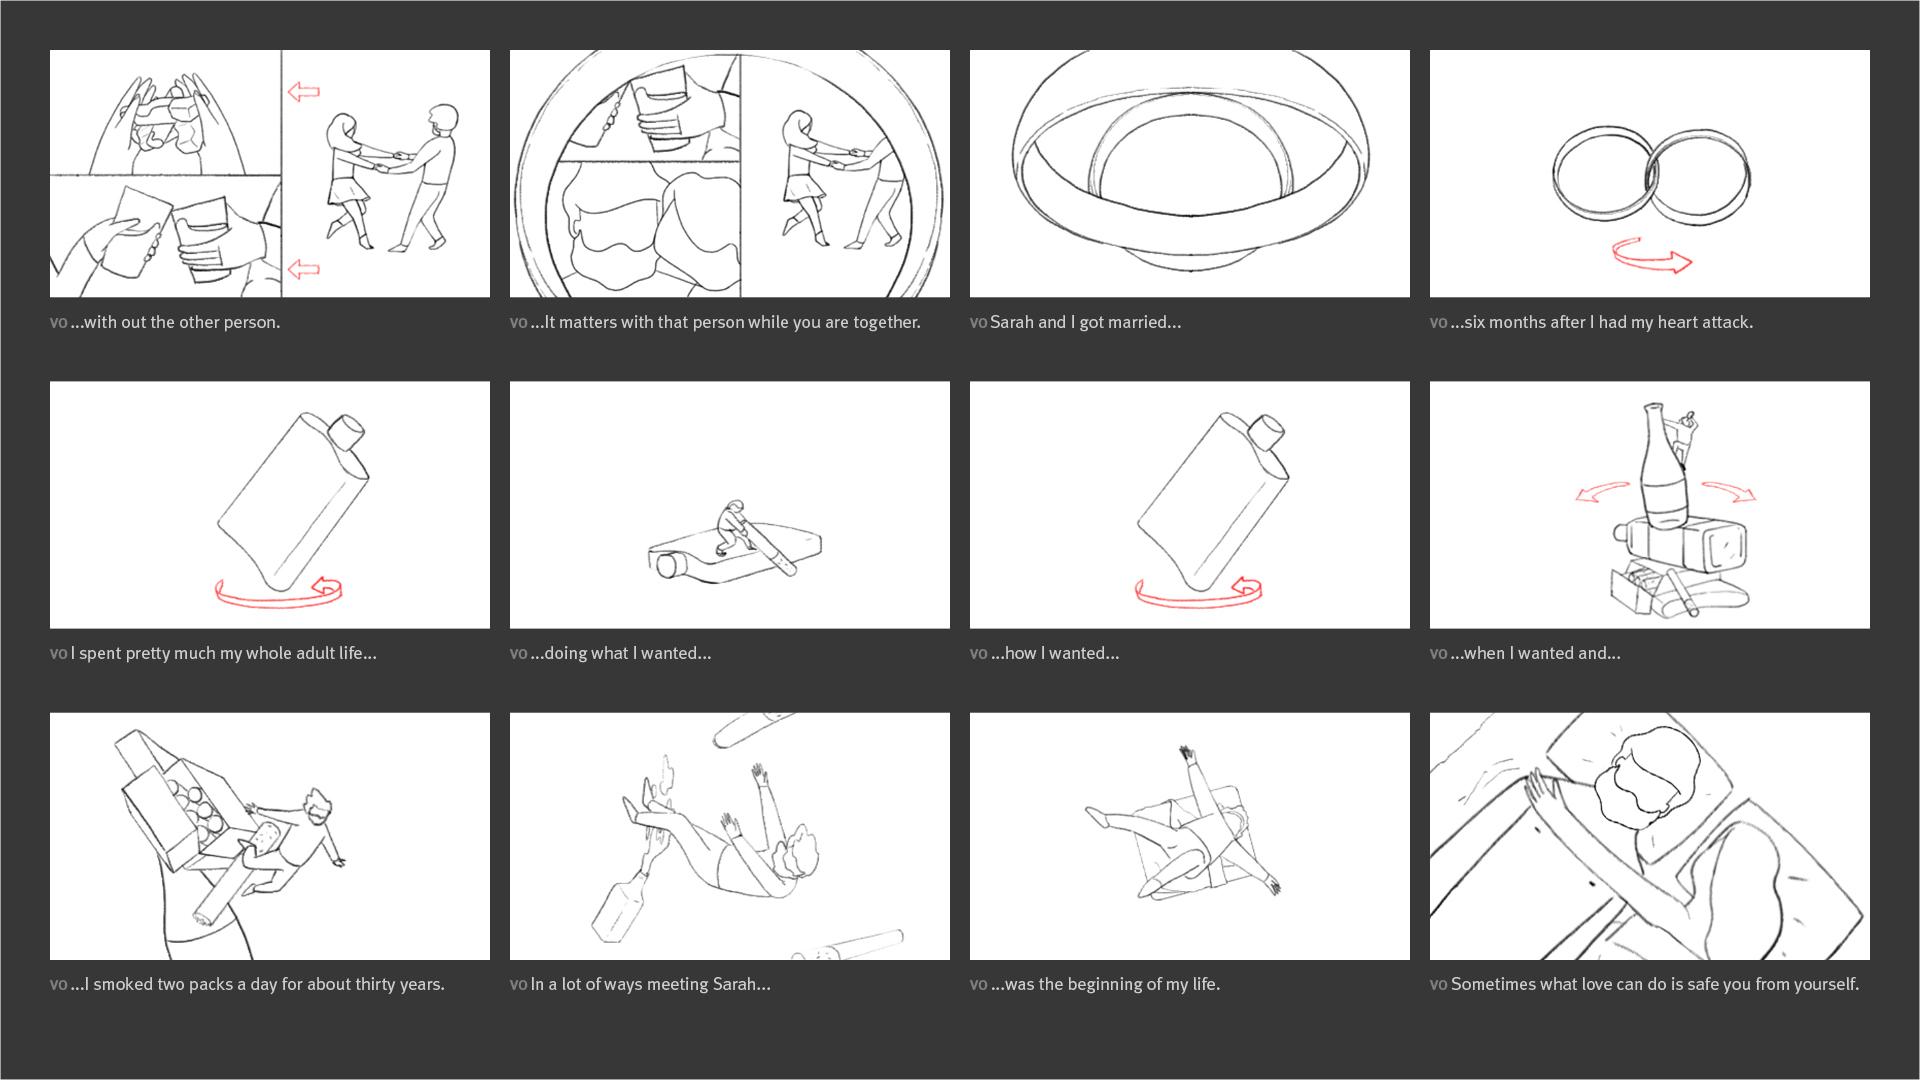 New York Times - Modern Love Storyboard 06